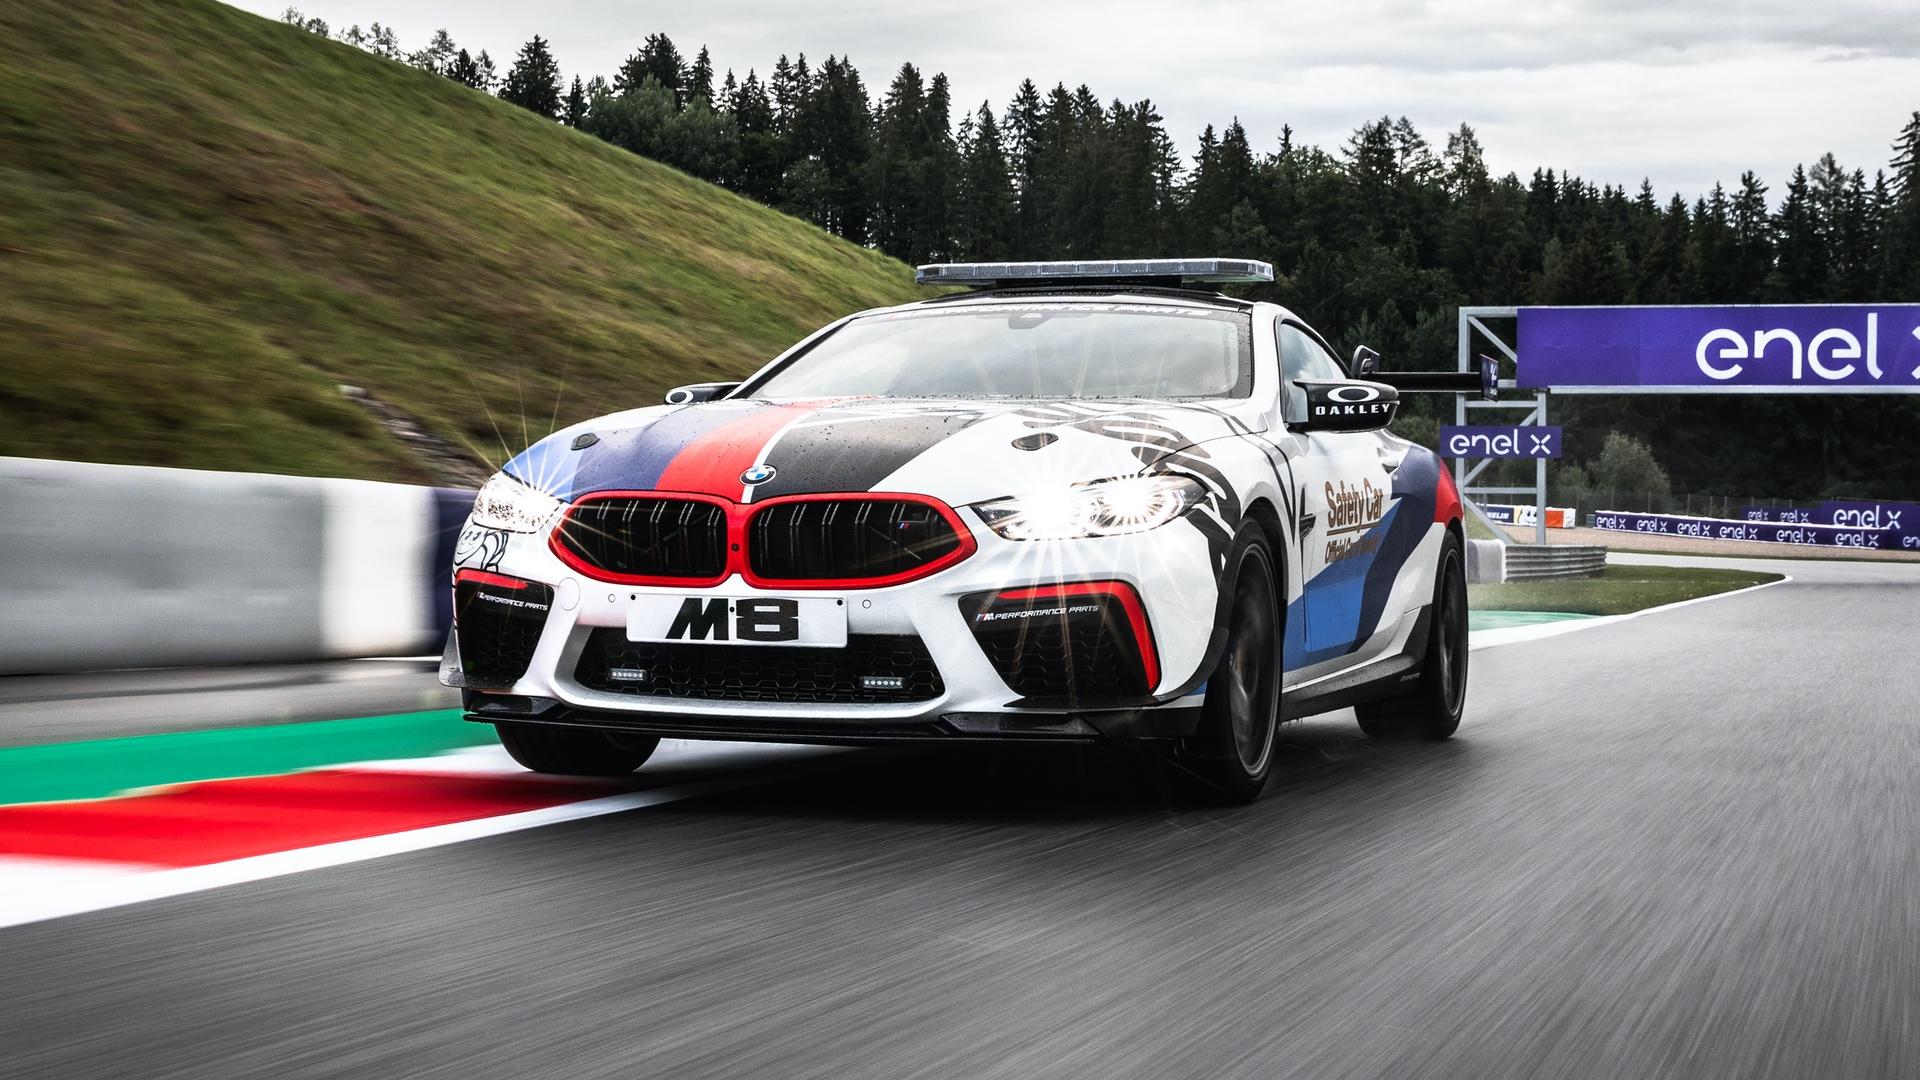 BMW_M8_MotoGP_Safety_Car_0014